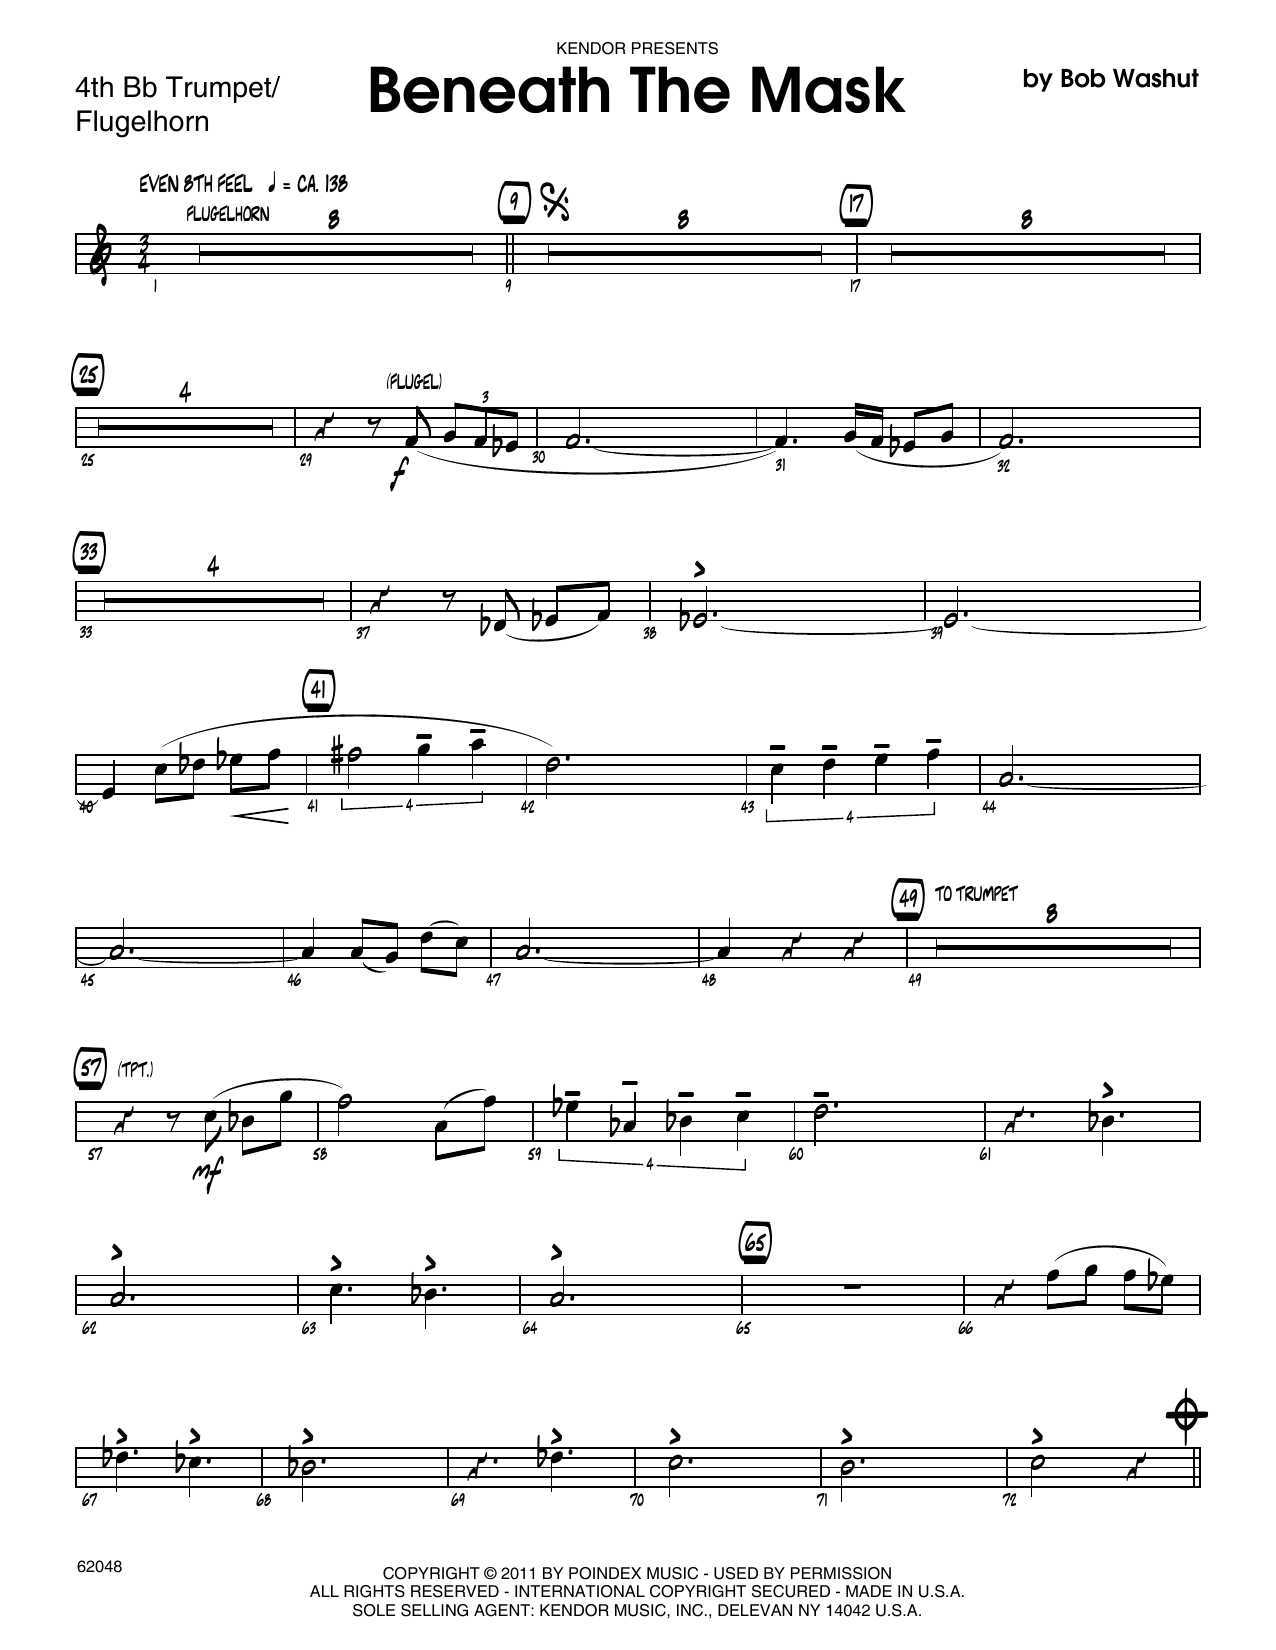 Beneath The Mask - 4th Bb Trumpet